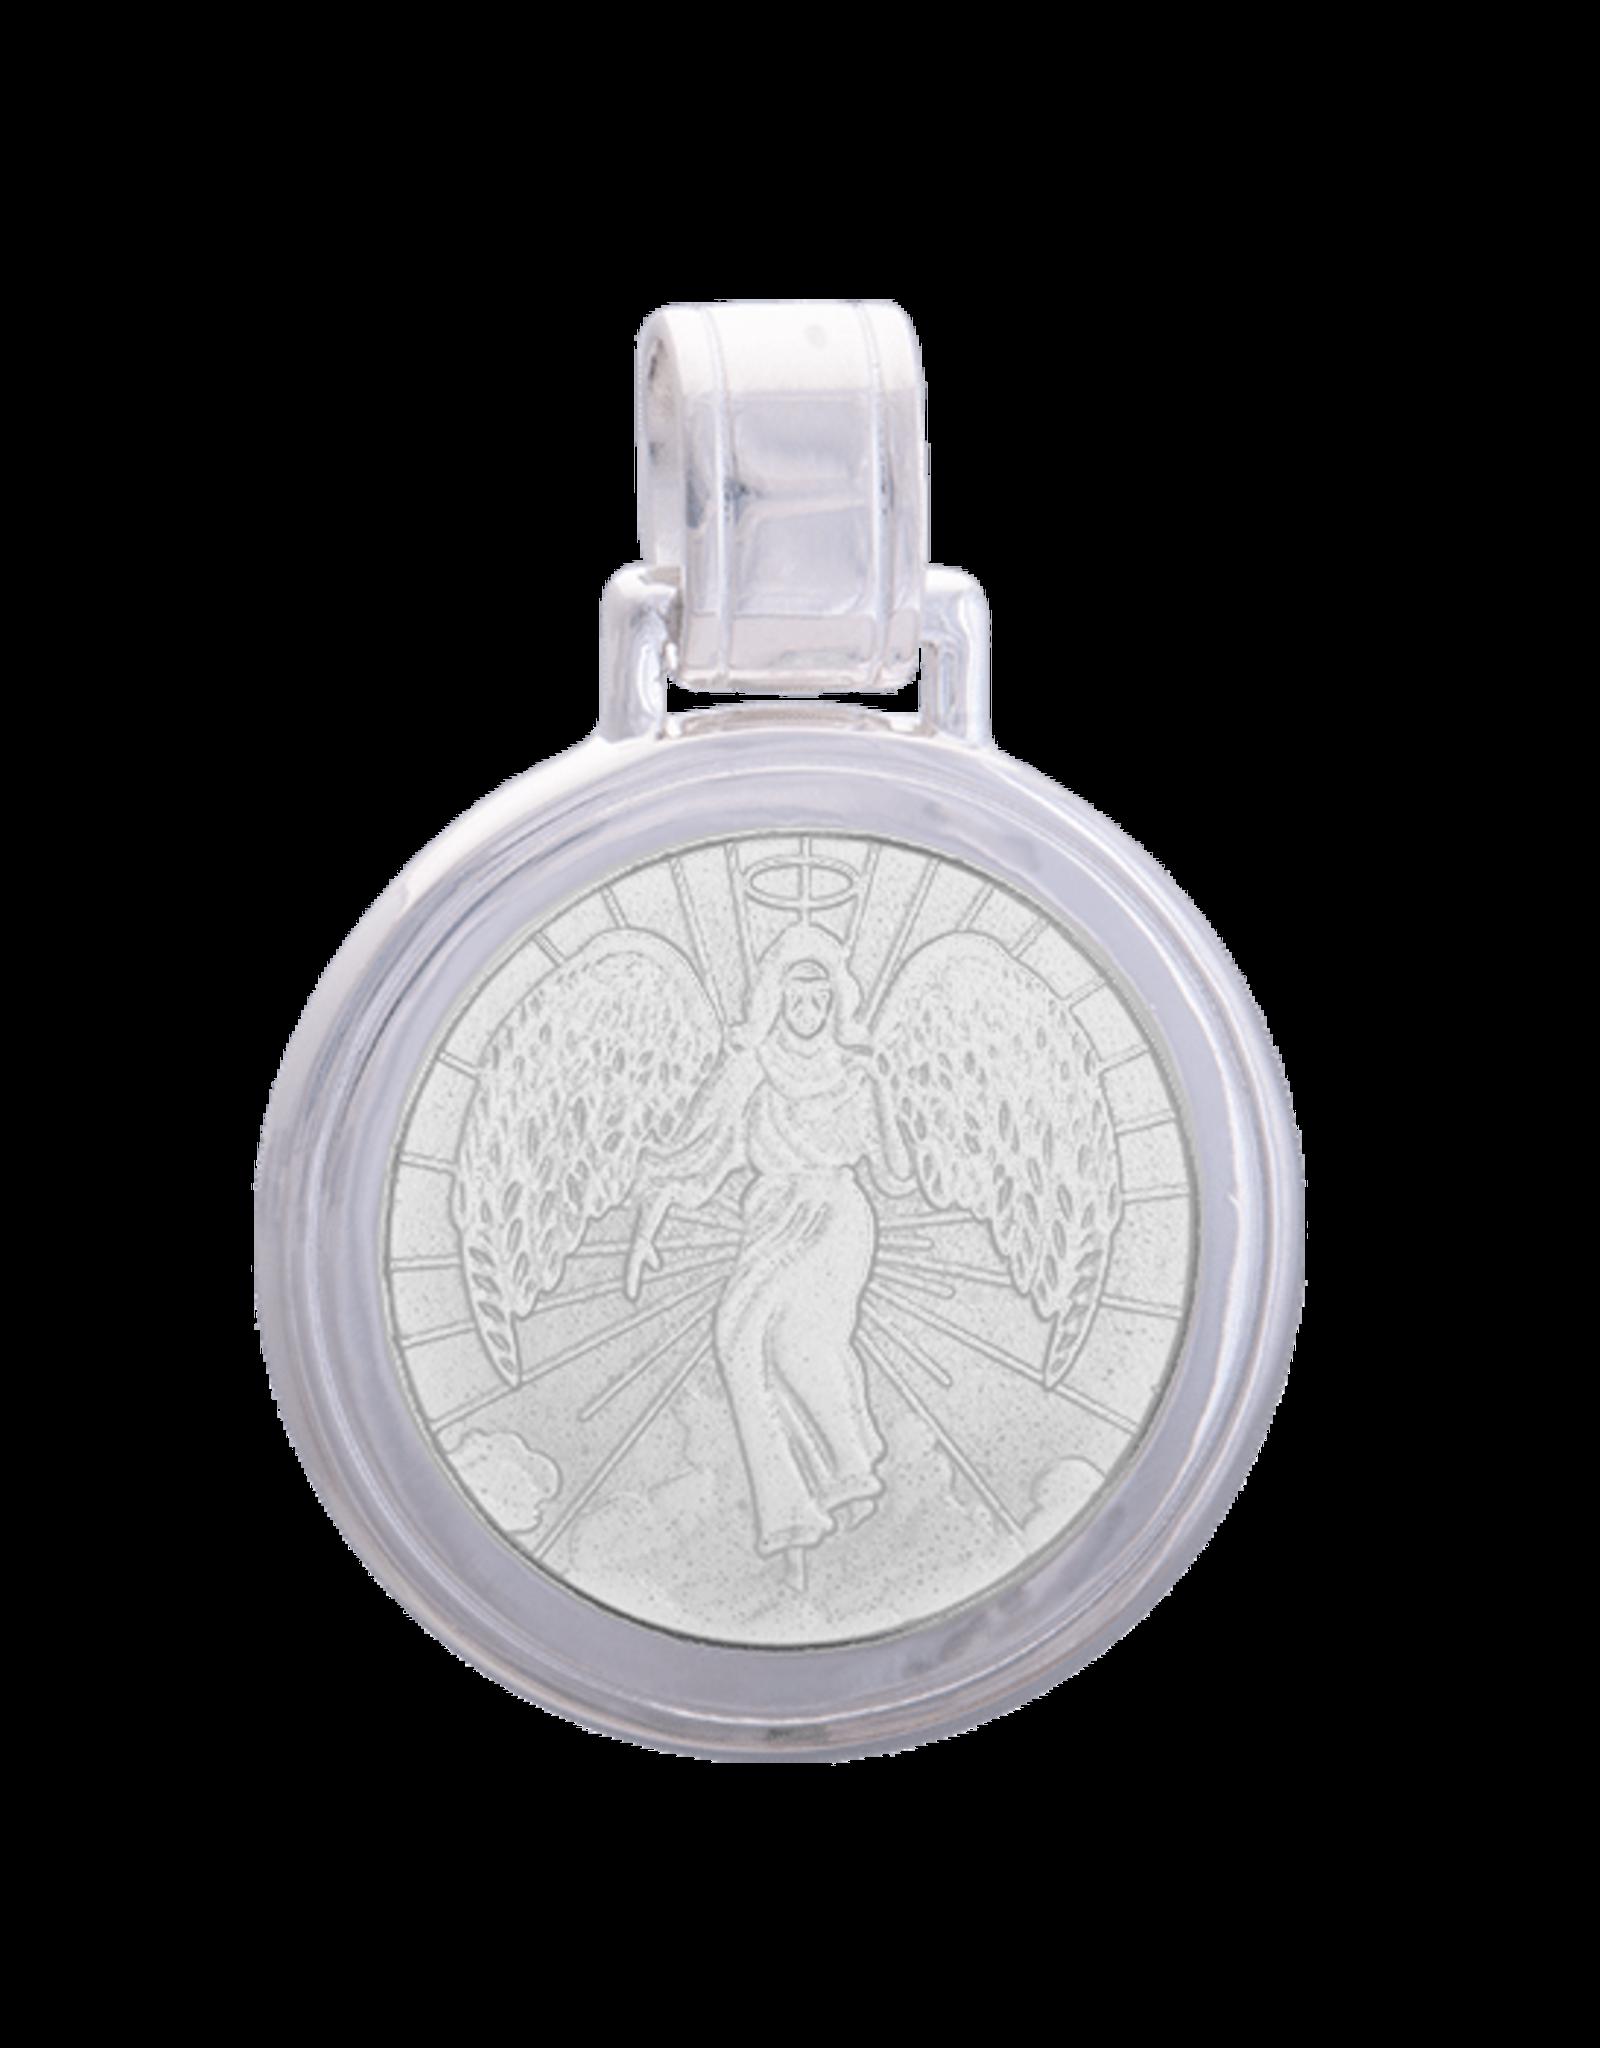 LoLa & Company Lola - Angel Pendant